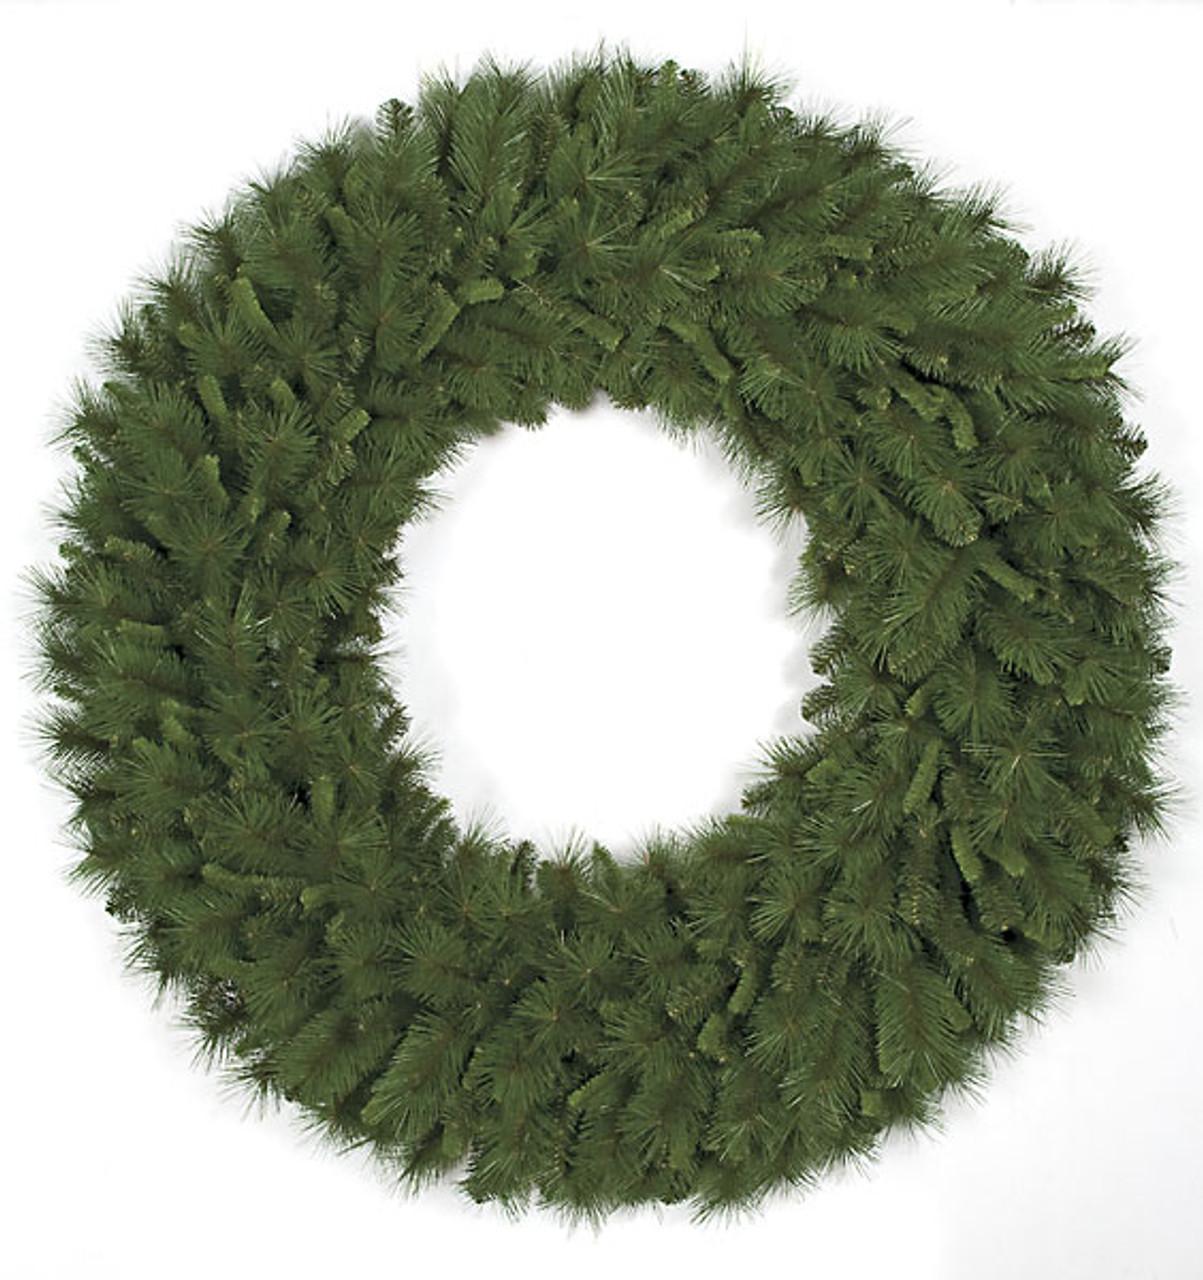 c 06015 60 mixed pine wreath pvc material